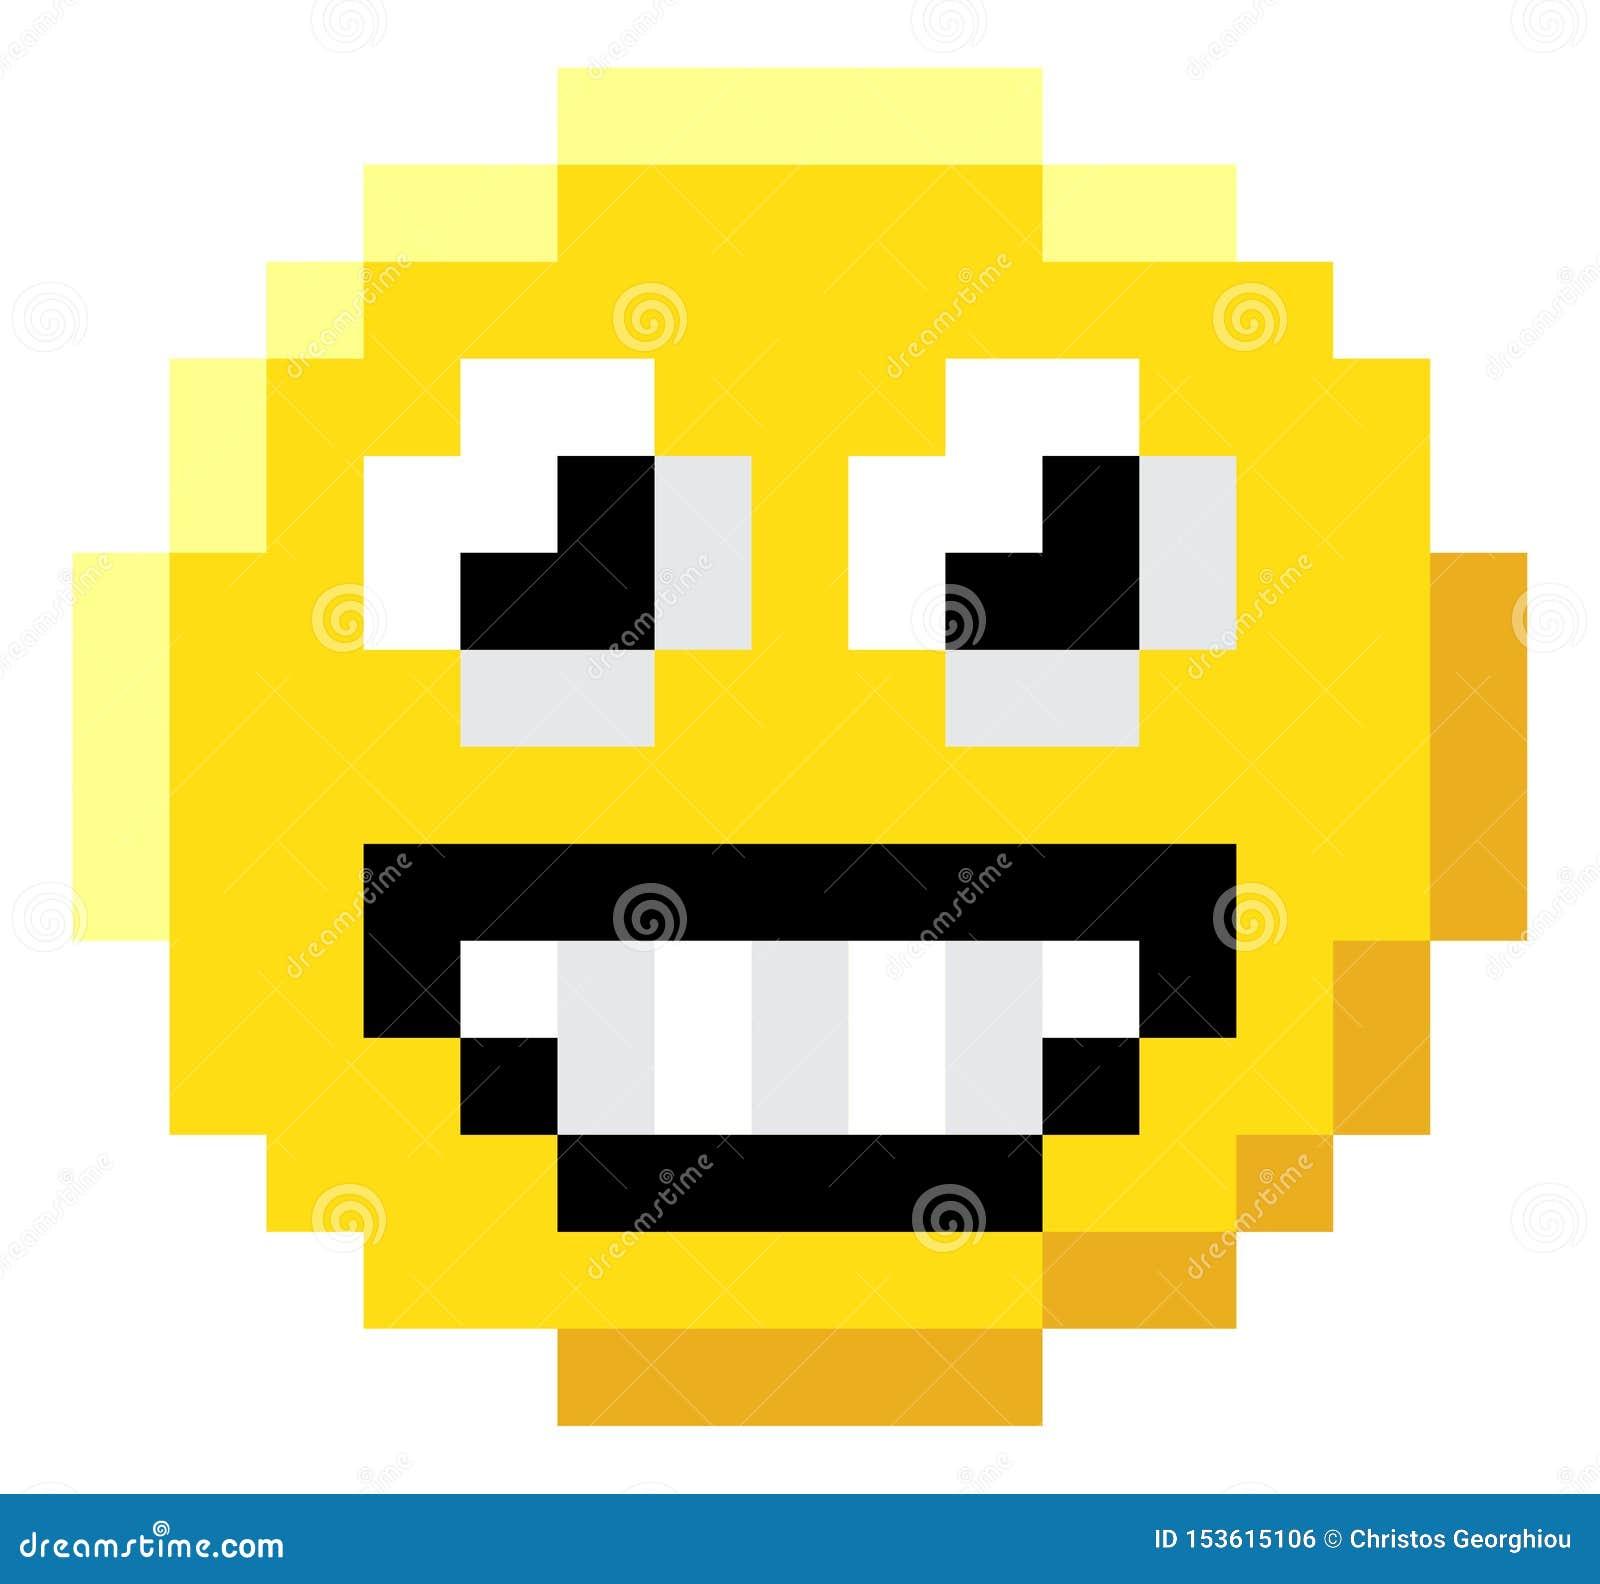 Emoticon Face Pixel Art 8 Bit Video Game Icon Stock Vector